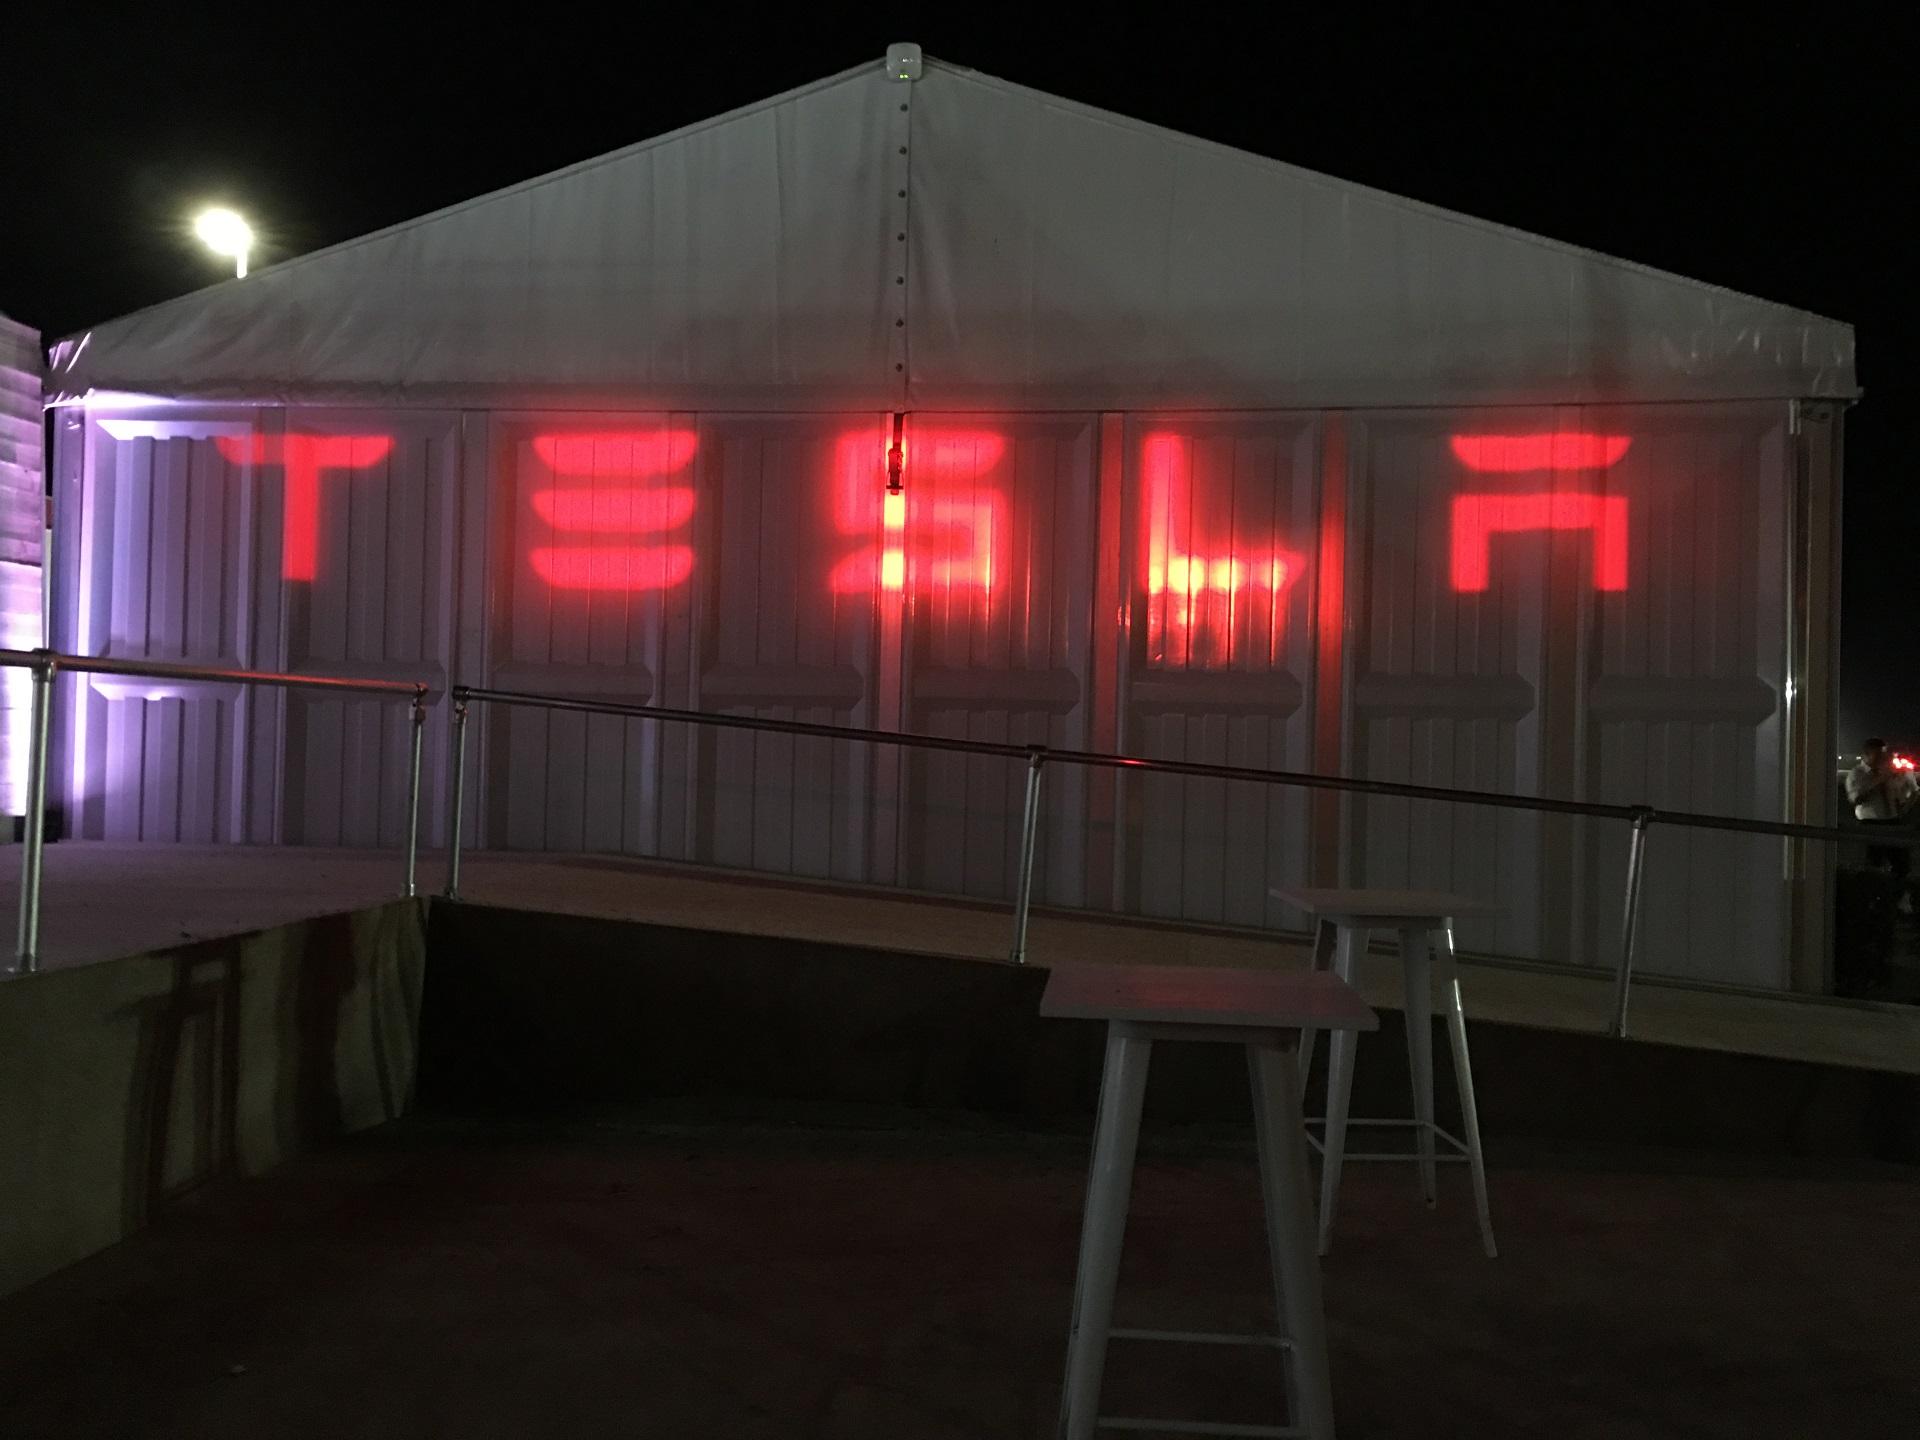 Tesla buys ultracapacitor company to boost energy density